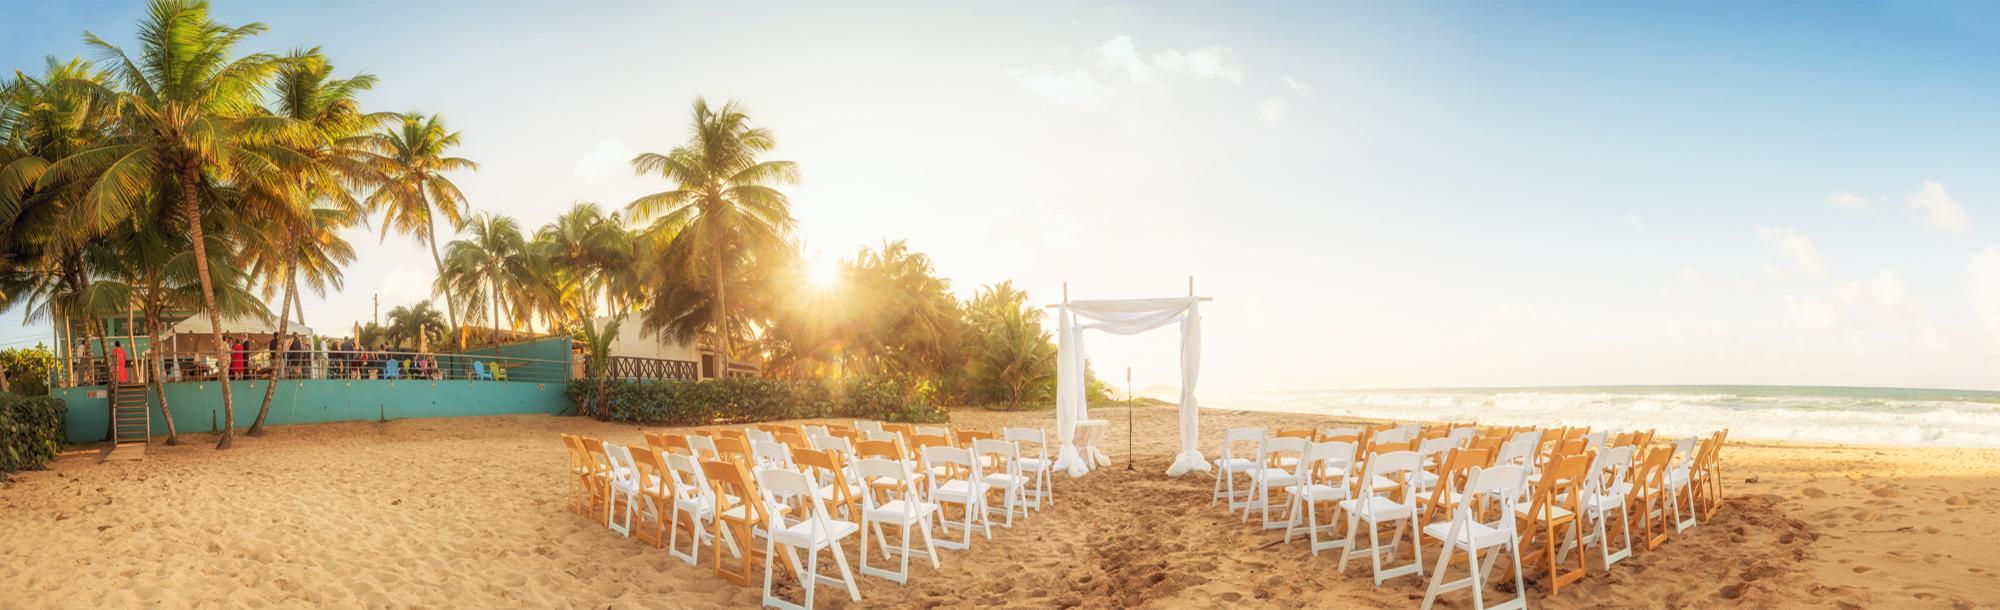 Yifan_Zhang_Geoff_Oberhofer_Carlin_Ma_wedding--20.jpg